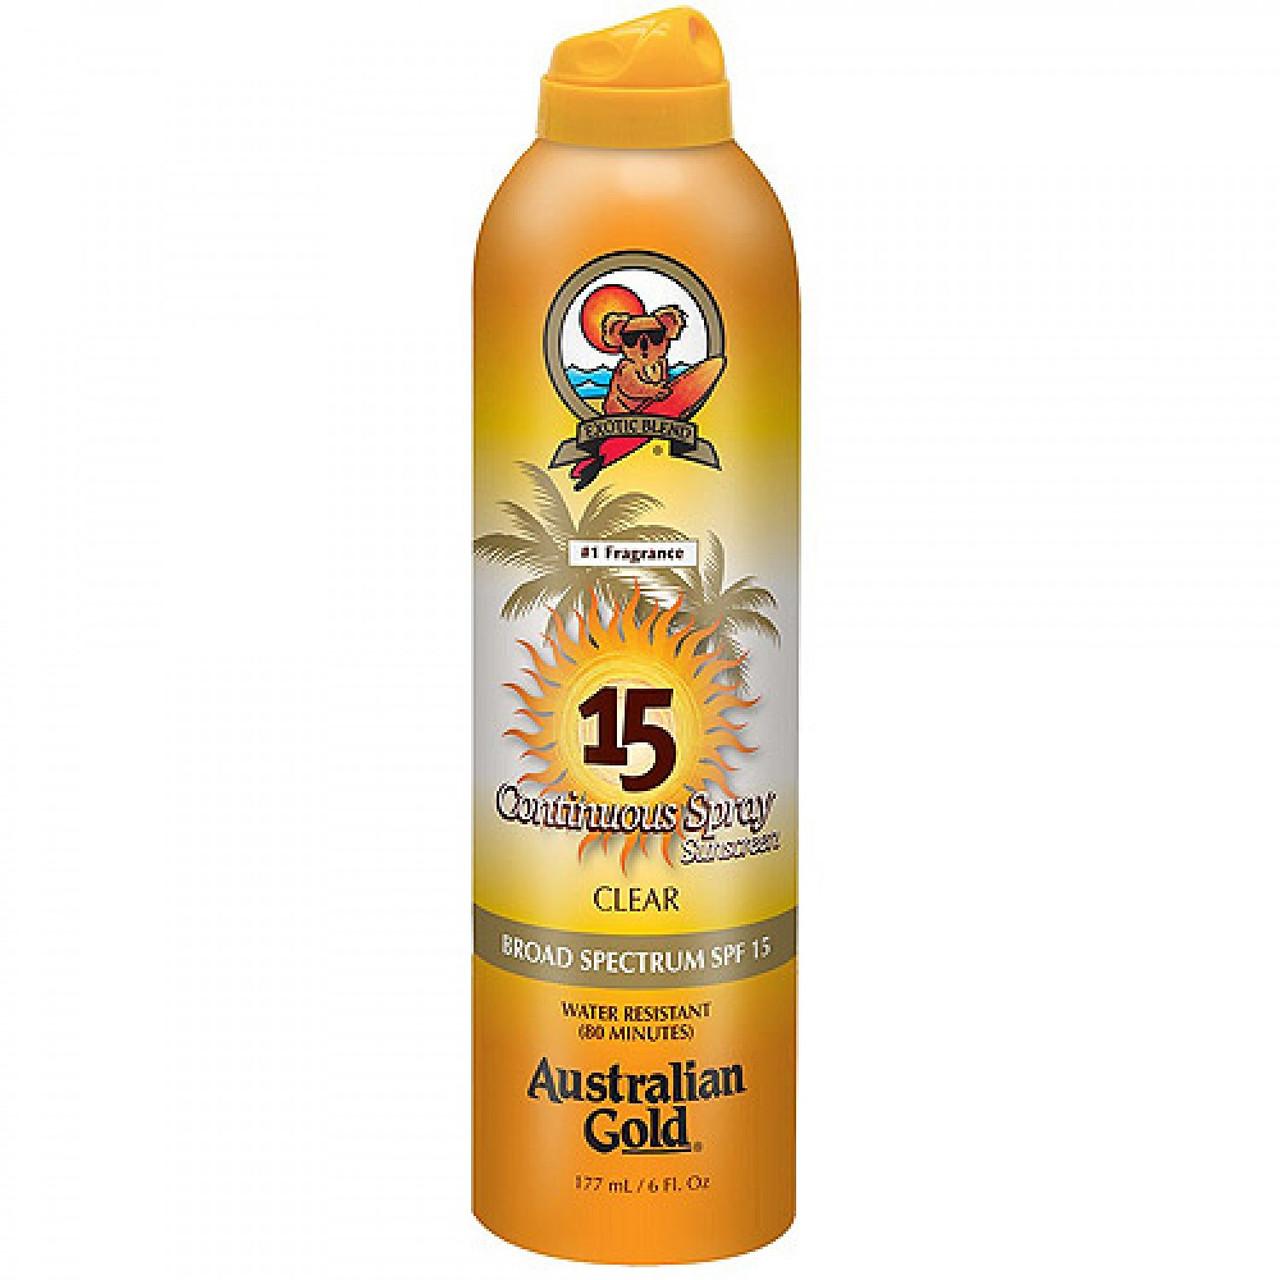 Солнцезащитный спрей Australian Gold Continuous Spray Clear SPF 15